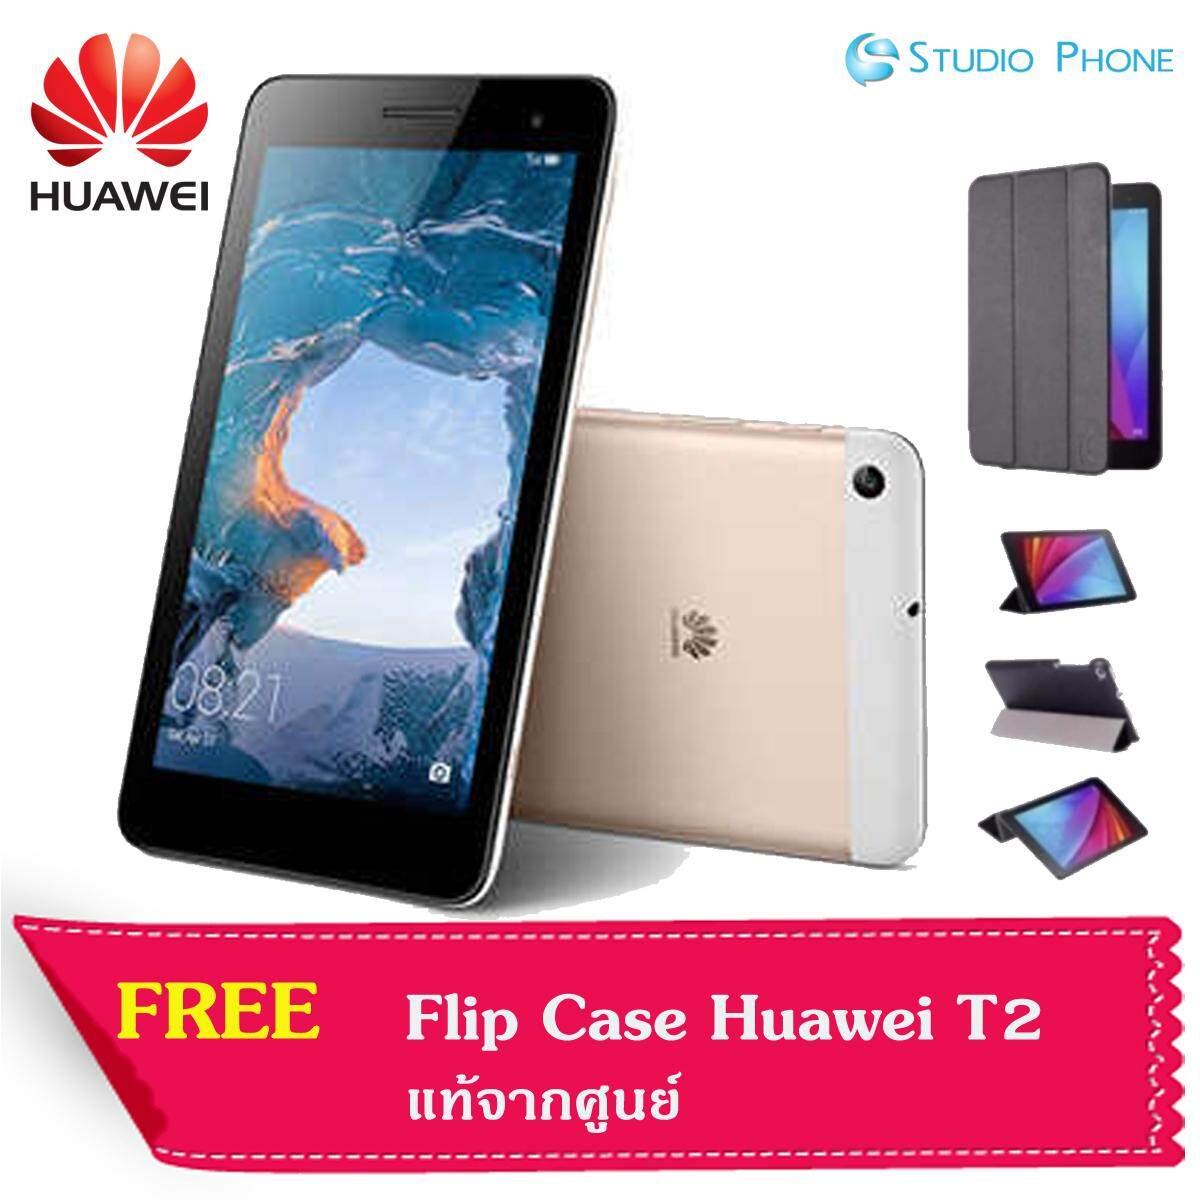 Huawei MediaPad T2 7.0 - สีchampagne 4G LTE (Free Flip case แท้จากศูนย์)